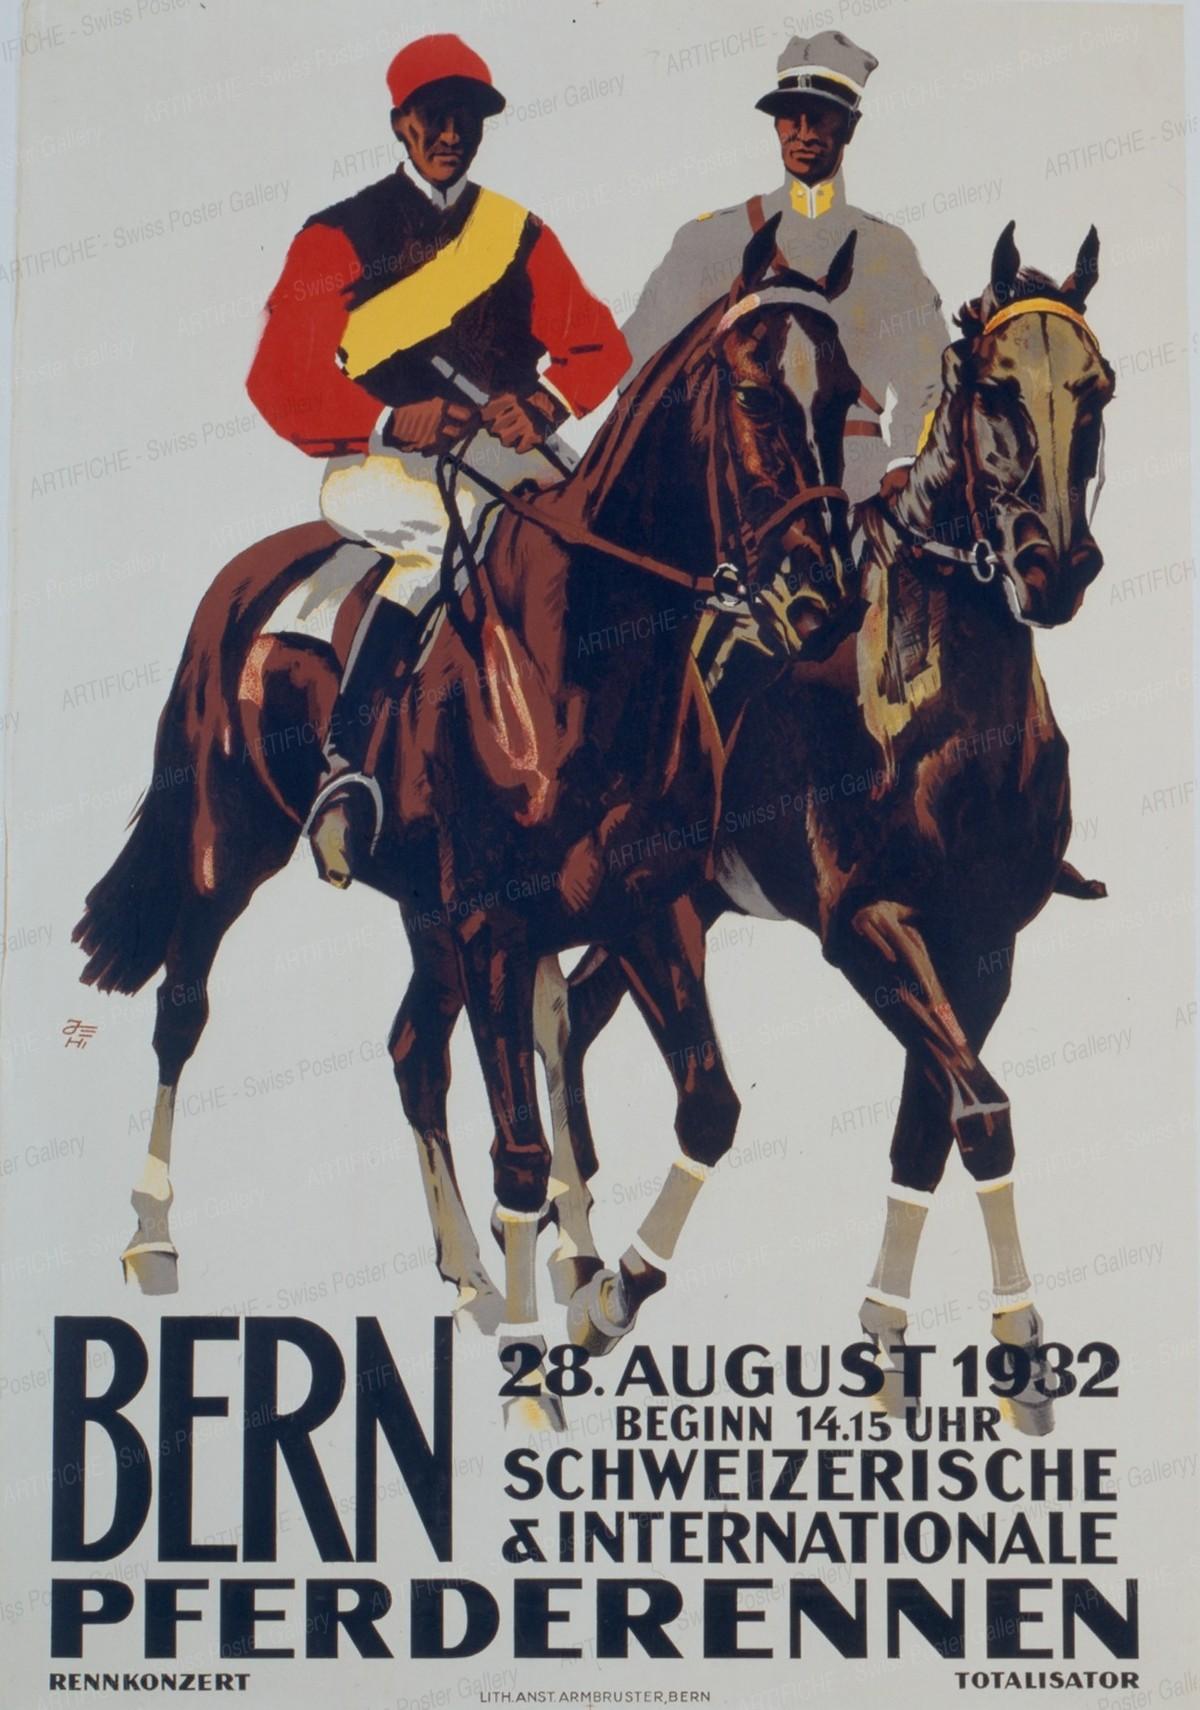 Bern, Pferderennen, 1932, Iwan Edwin Hugentobler